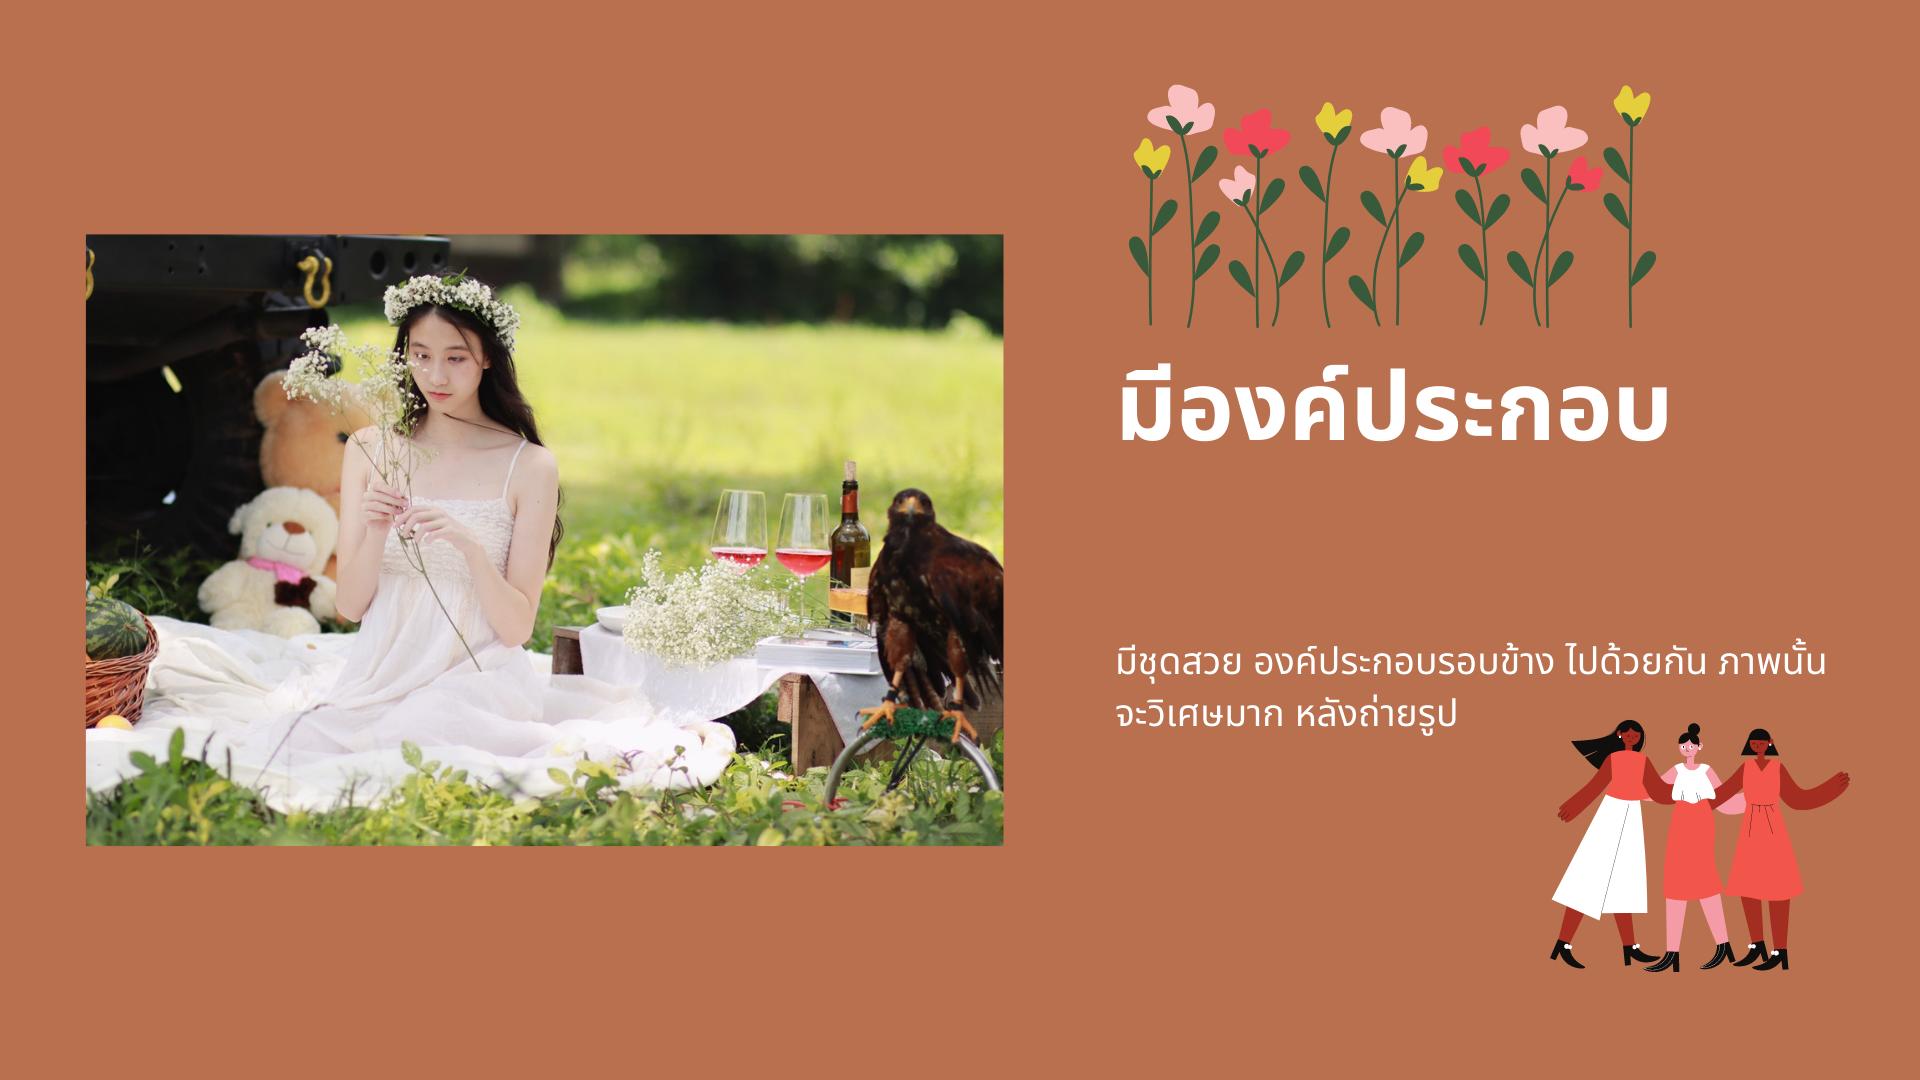 📌 Konthaitour Photo Tip  🌺 ในฐานะที่คนไทยทัวร์ ถ่ายรูปบ่อย  ขอแนะนำ ท่าโพสของสาวๆ และ สวยมาก  ✌️ เรียกไลค์ได้แบบปังๆ ตามความคิดส่วนตัว เจ้า 🚐🚐🚐🚐🚐🚐🚐🚐🚐🚐🚐🚐🚐🚐🚐 🙏แพ็กเก็จทัวร์เหนือ ทริปส่วนตัวทุกคณะ 1.ทริปเชียงใหม่ ม๋วนใจ 3-5 วัน * <font color=red>***</font>ดีตลอดปี 2.ทริปหรรษา เชียงใหม่ –เชียงราย 3-5 วัน 3.ทริปเชียงใหม่ –แม่ฮ่องสอน -ปาย 3-4 วัน * 4..ทริปถ่ายรูป ทุกรูปแบบ Photo portrait ,landscape 5.ทริปแล้วแต่คนไทยทัวร์จัดมา 6.Team Building and MICE 📌 ไม่มีการส่งต่อทัวร์ มั่นใจด้วยประสบการณ์มากกว่า 14 ปี คุ้มค่าทุกแพ็กเก็จ 📌 Company Trip / Company Outing / ประชุมสัมมนา / Theme Party งานจัดเลี้ยง Event/ สันทนาการ /ท่องเที่ยวเพื่อเป็นรางวัล 📌 Incentive tour / CSR / Staff Party / กิจกรรมละลายพฤติกรรม ขอให้บอกเรา เราจัดการได้ ตอบโจทย์ทุกความต้องการ 👉 จองแพ็กเก็จทัวร์ ☎ : 063-7892562 Line id :@konthaitour www.konthaitour.com ( Thai ) #จัดทริปเชียงใหม่ #จัดทัวร์เชียงใหม่ #หาทัวร์เชียงใหม่ #เชียงใหม่ #คนไทยทัวร์